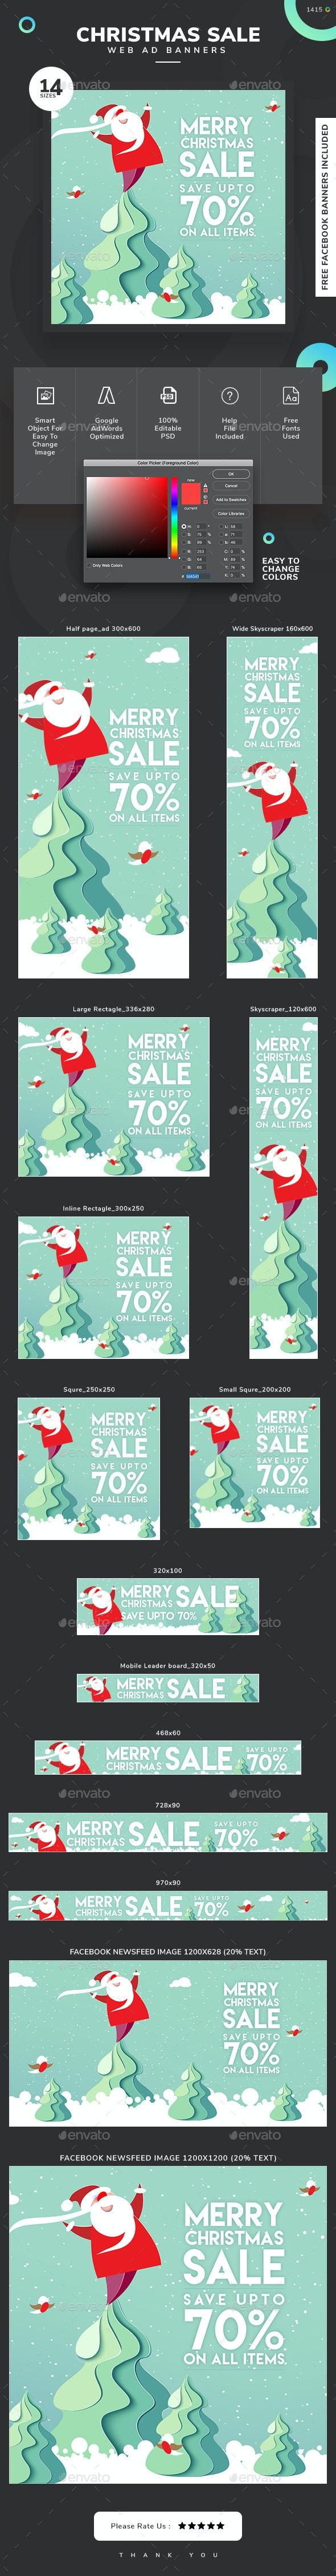 Christmas Sale Web Banner Set - Banners & Ads Web Elements